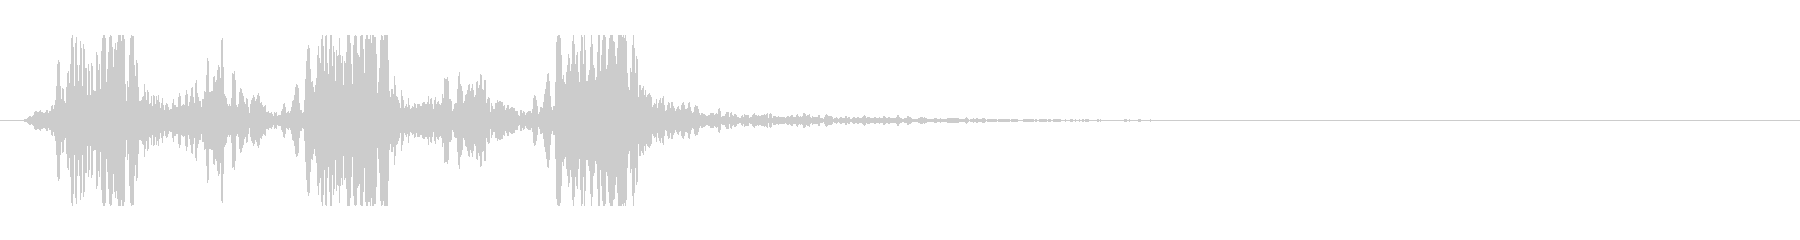 SONAR:WHALE-LIKE ...の未再生の波形